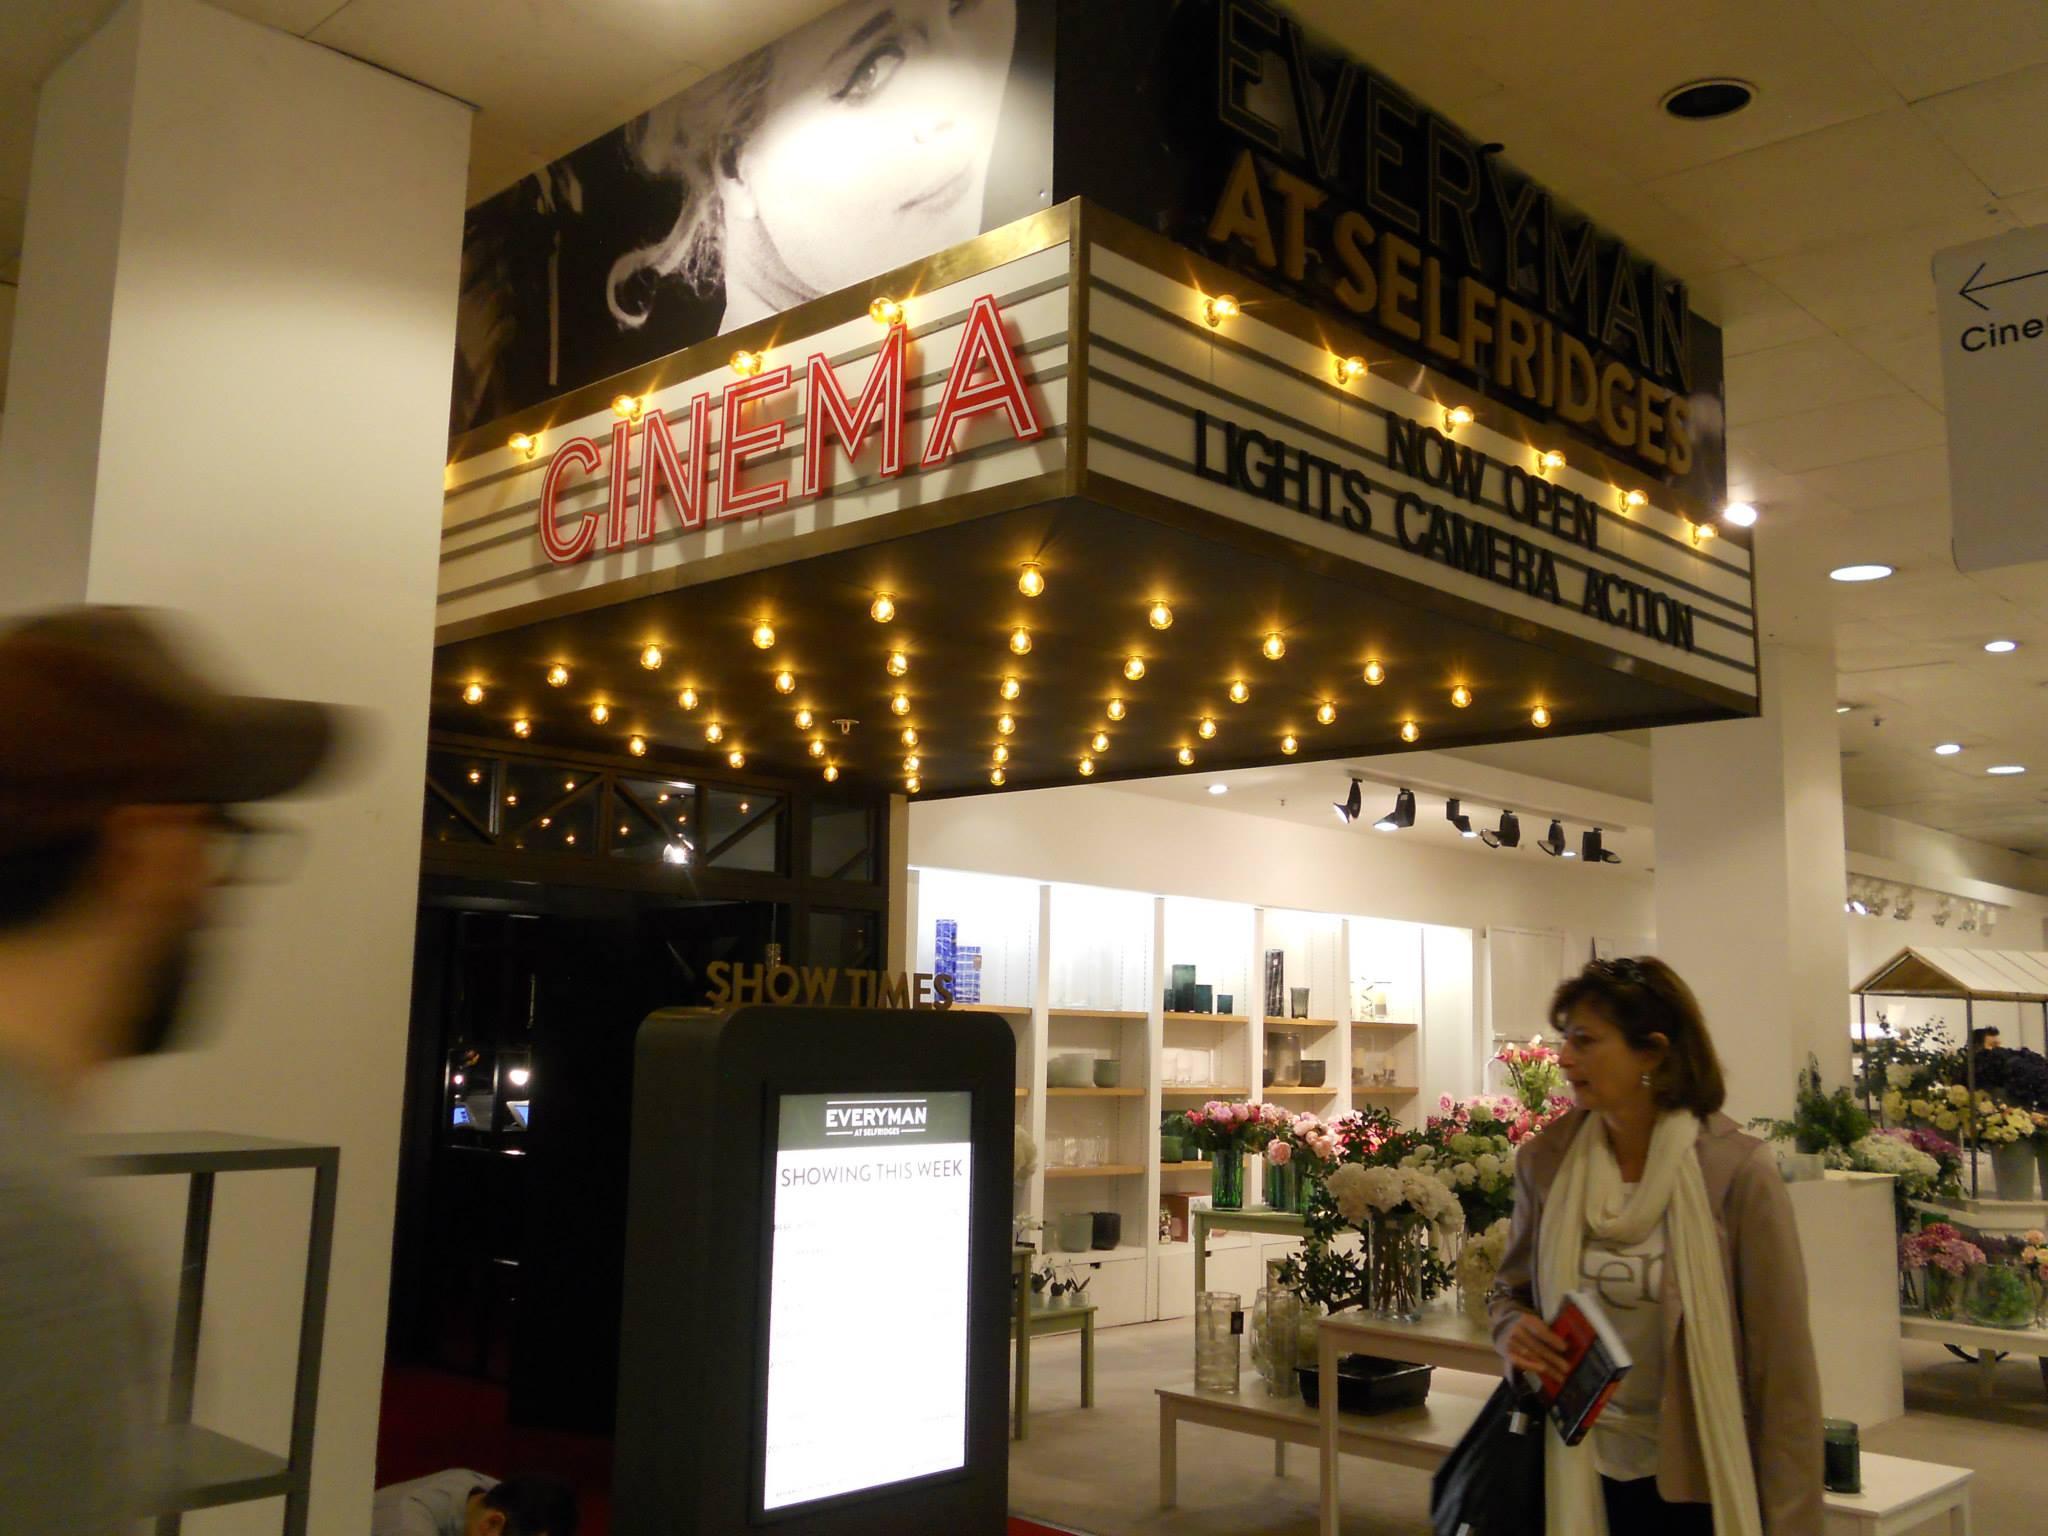 selfridges-everyman-cinema-lights-camera-action